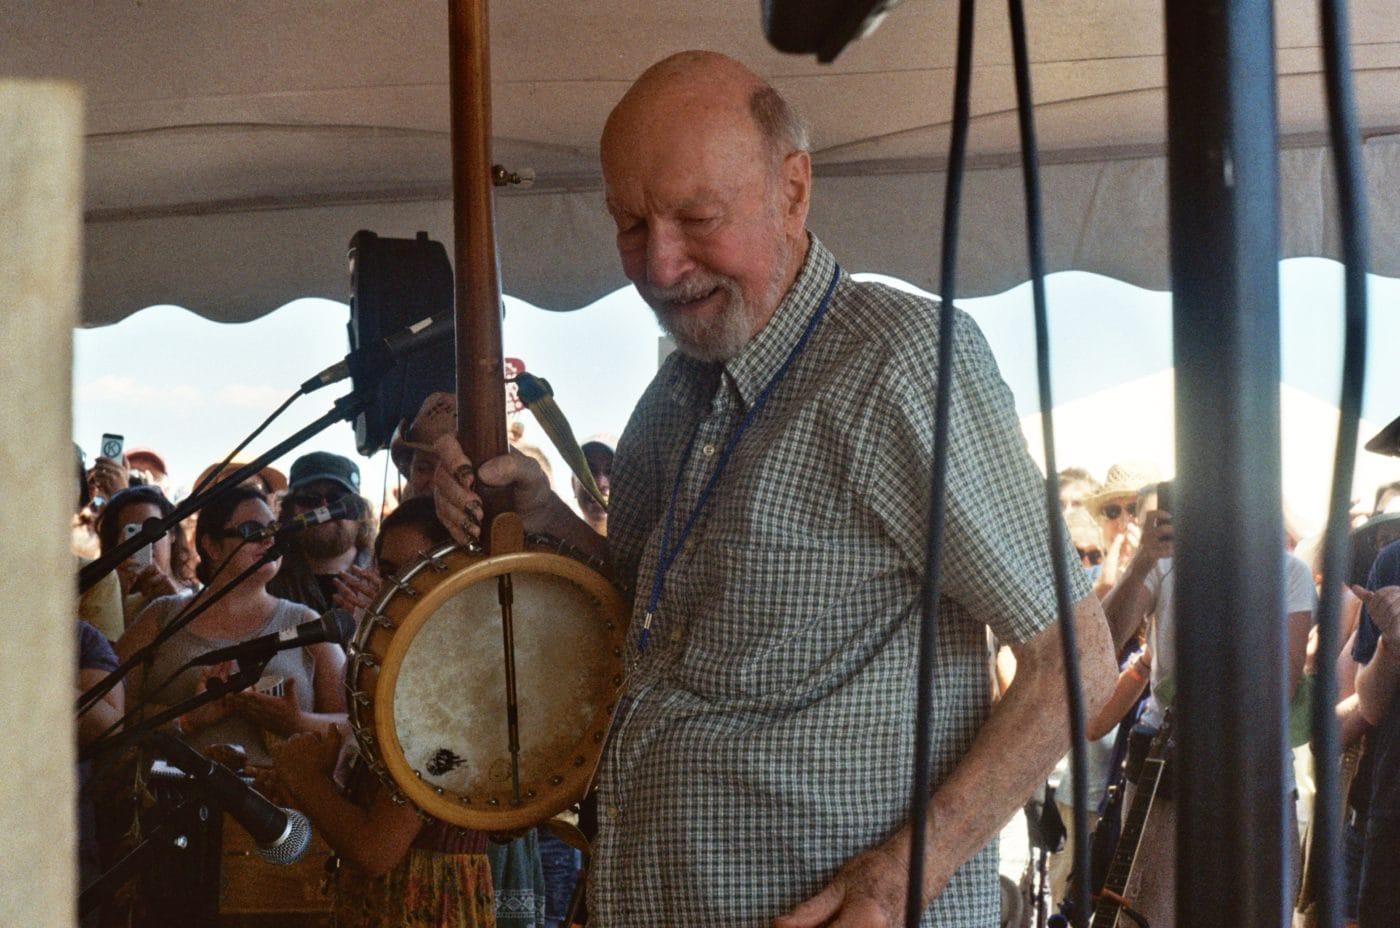 Pete Seeger at Newport Folk Festival, 2011